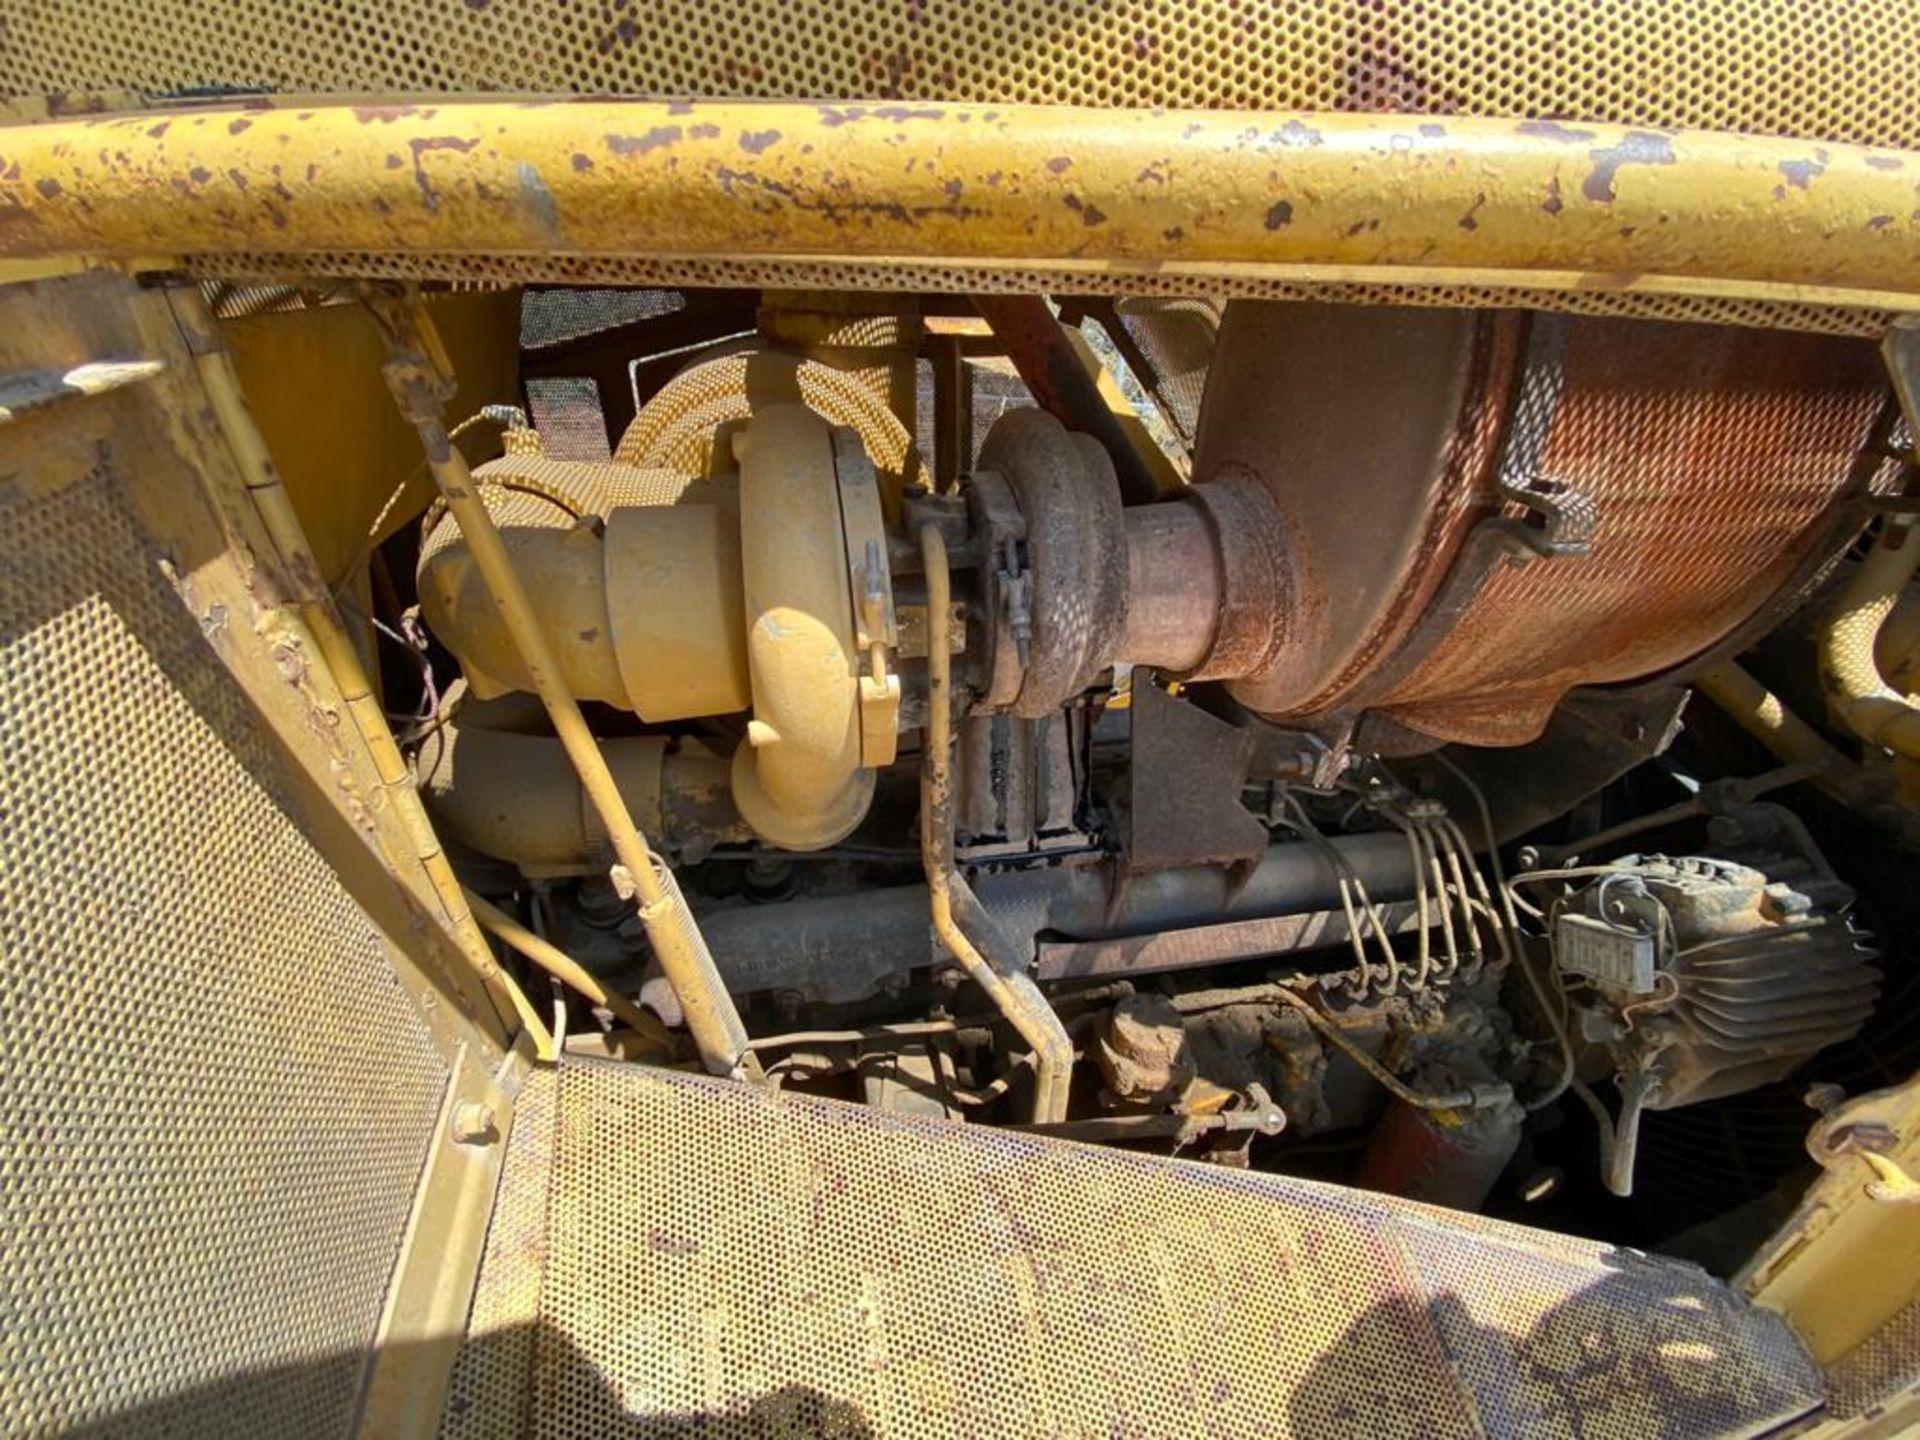 Caterpillar D7G Bulldozer, Serial number 92V5897, Diesel motor - Image 37 of 48